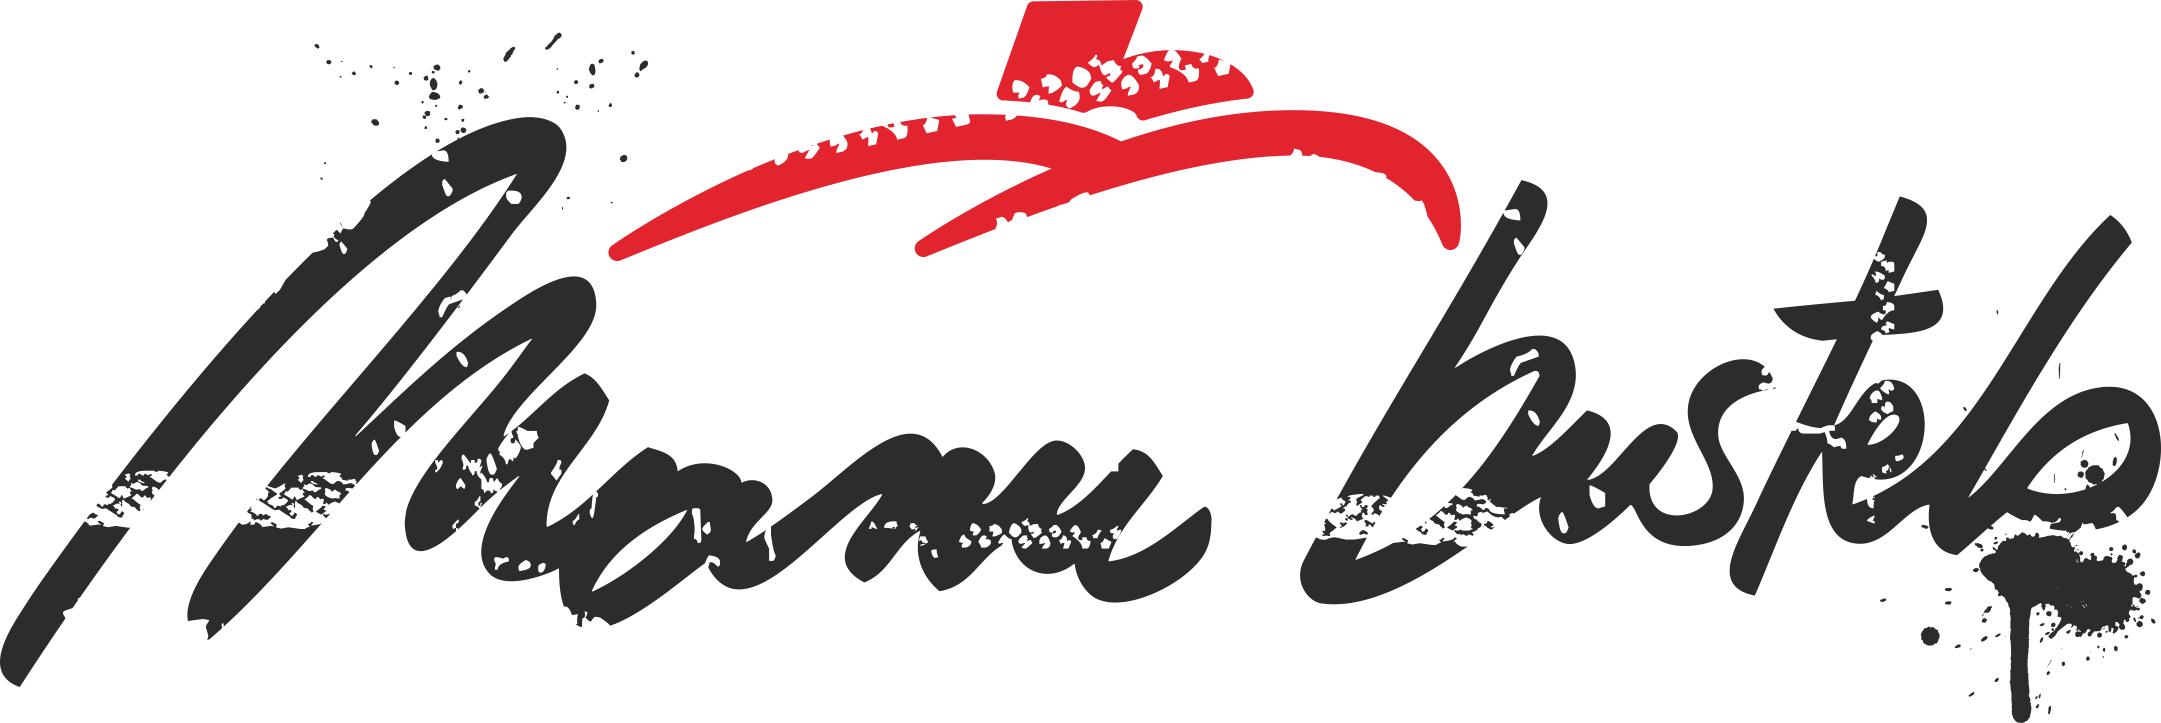 manu_bustelo_logo.png